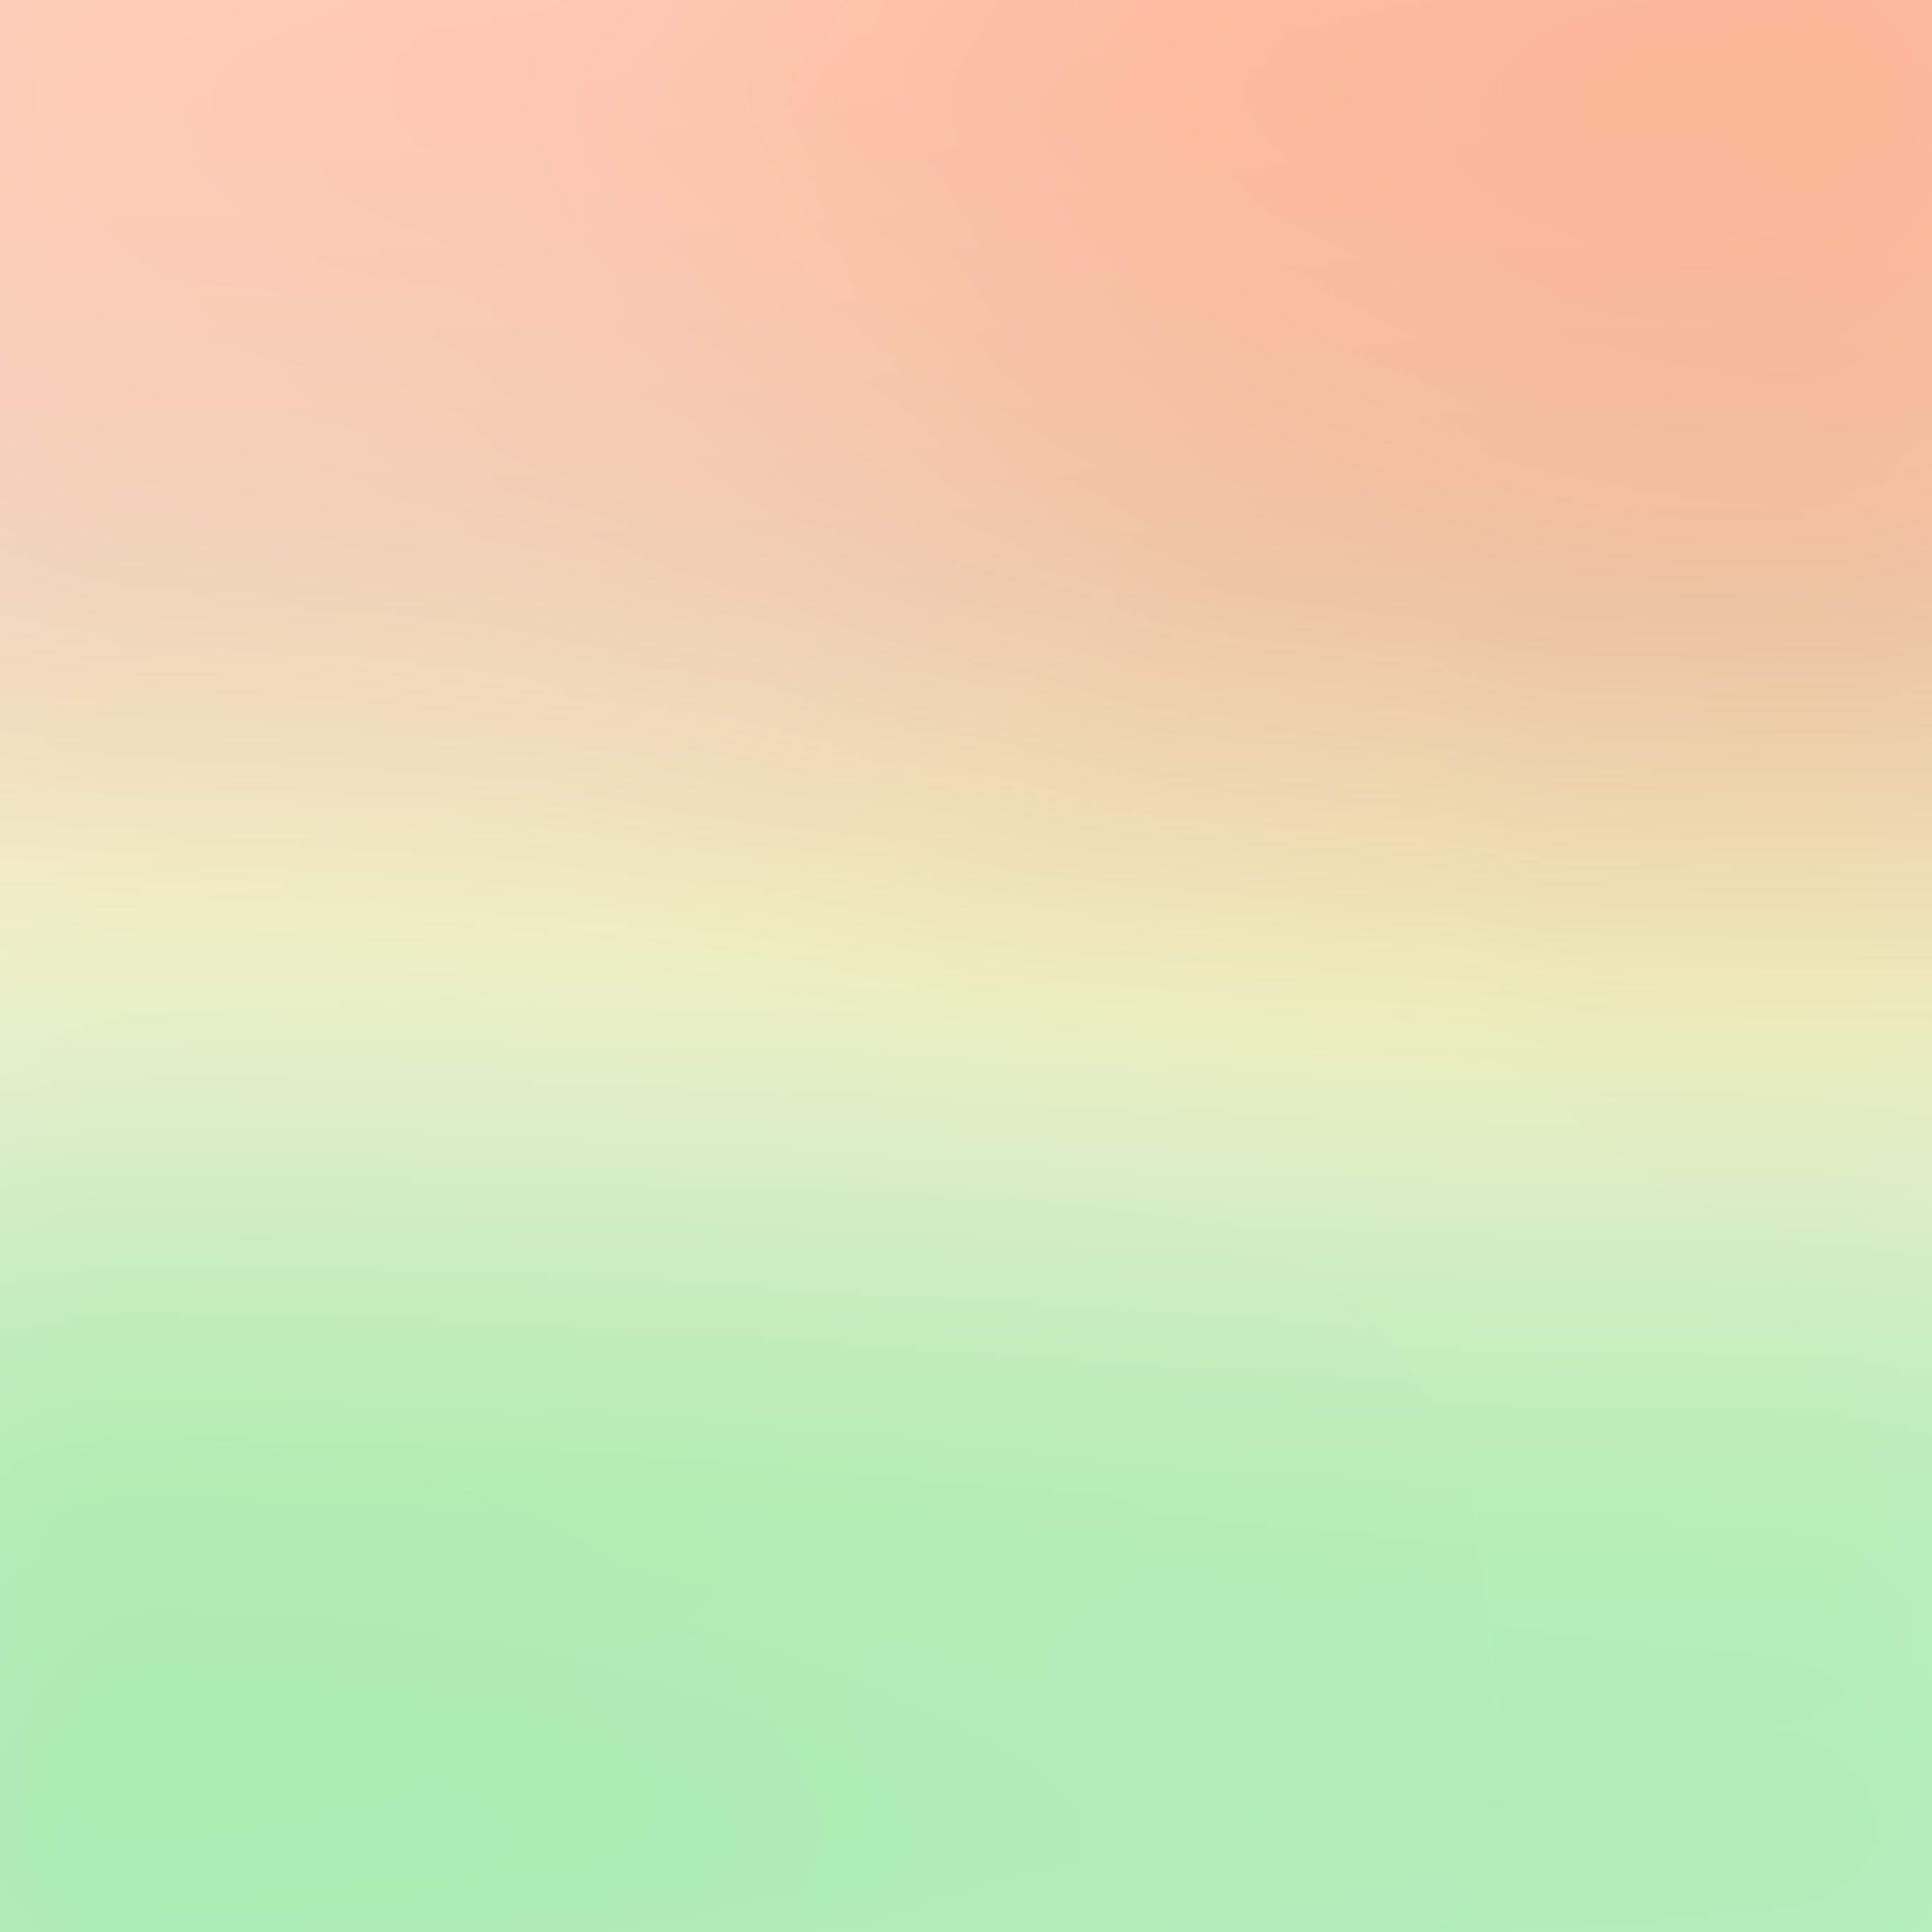 Papersco Ipad Wallpaper Sl92 Red Green Pastel Blur